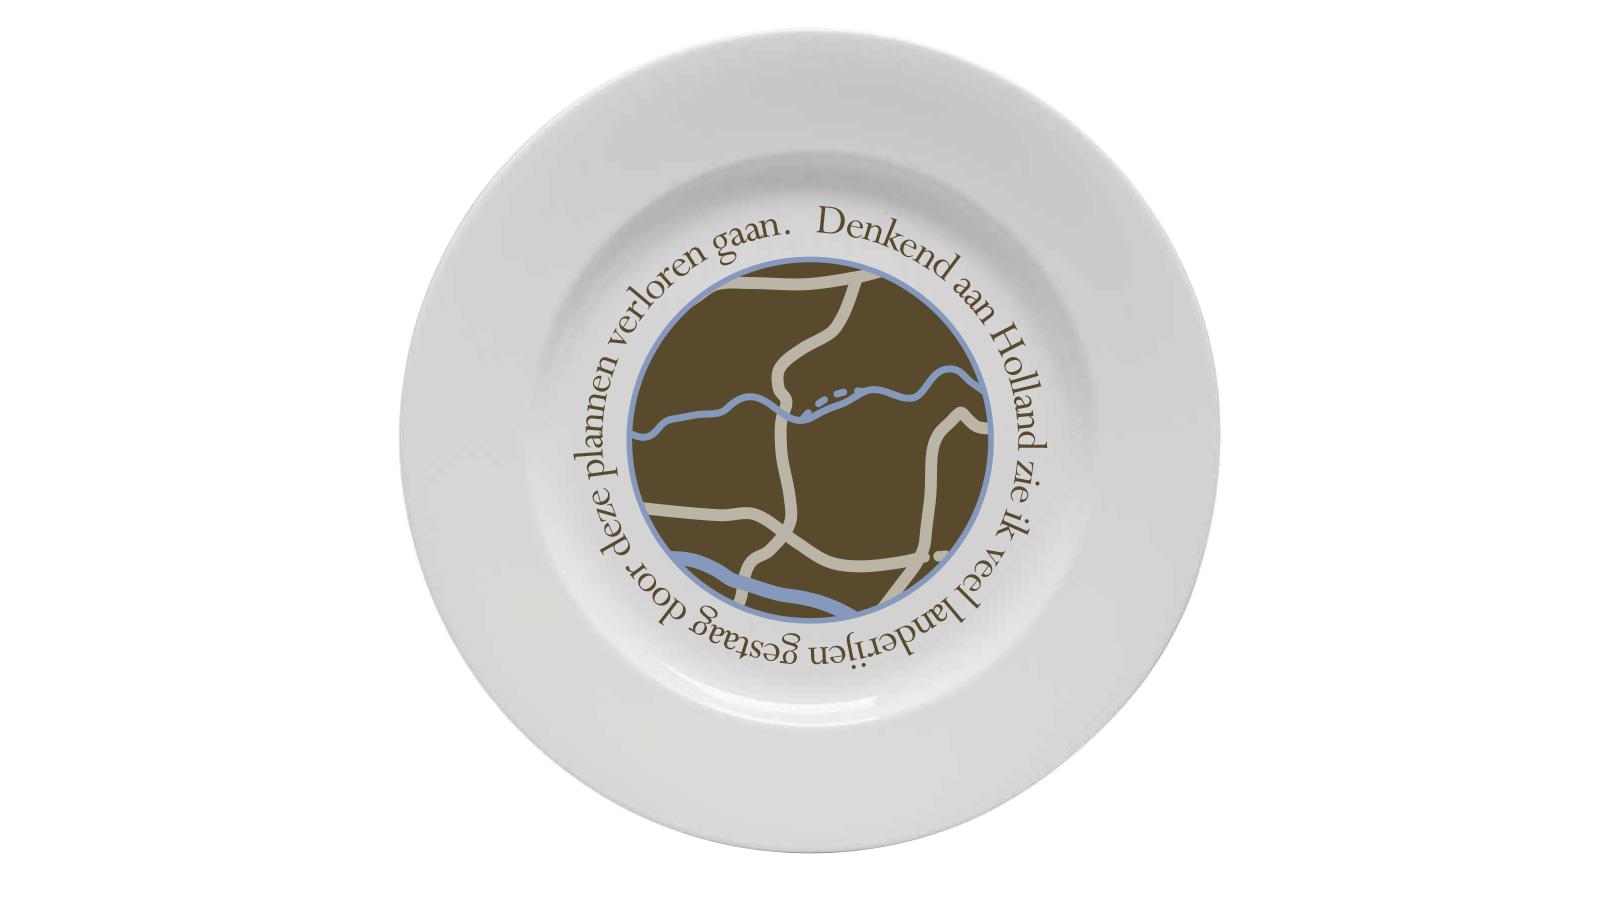 LandRaad Ontbijtbord 4